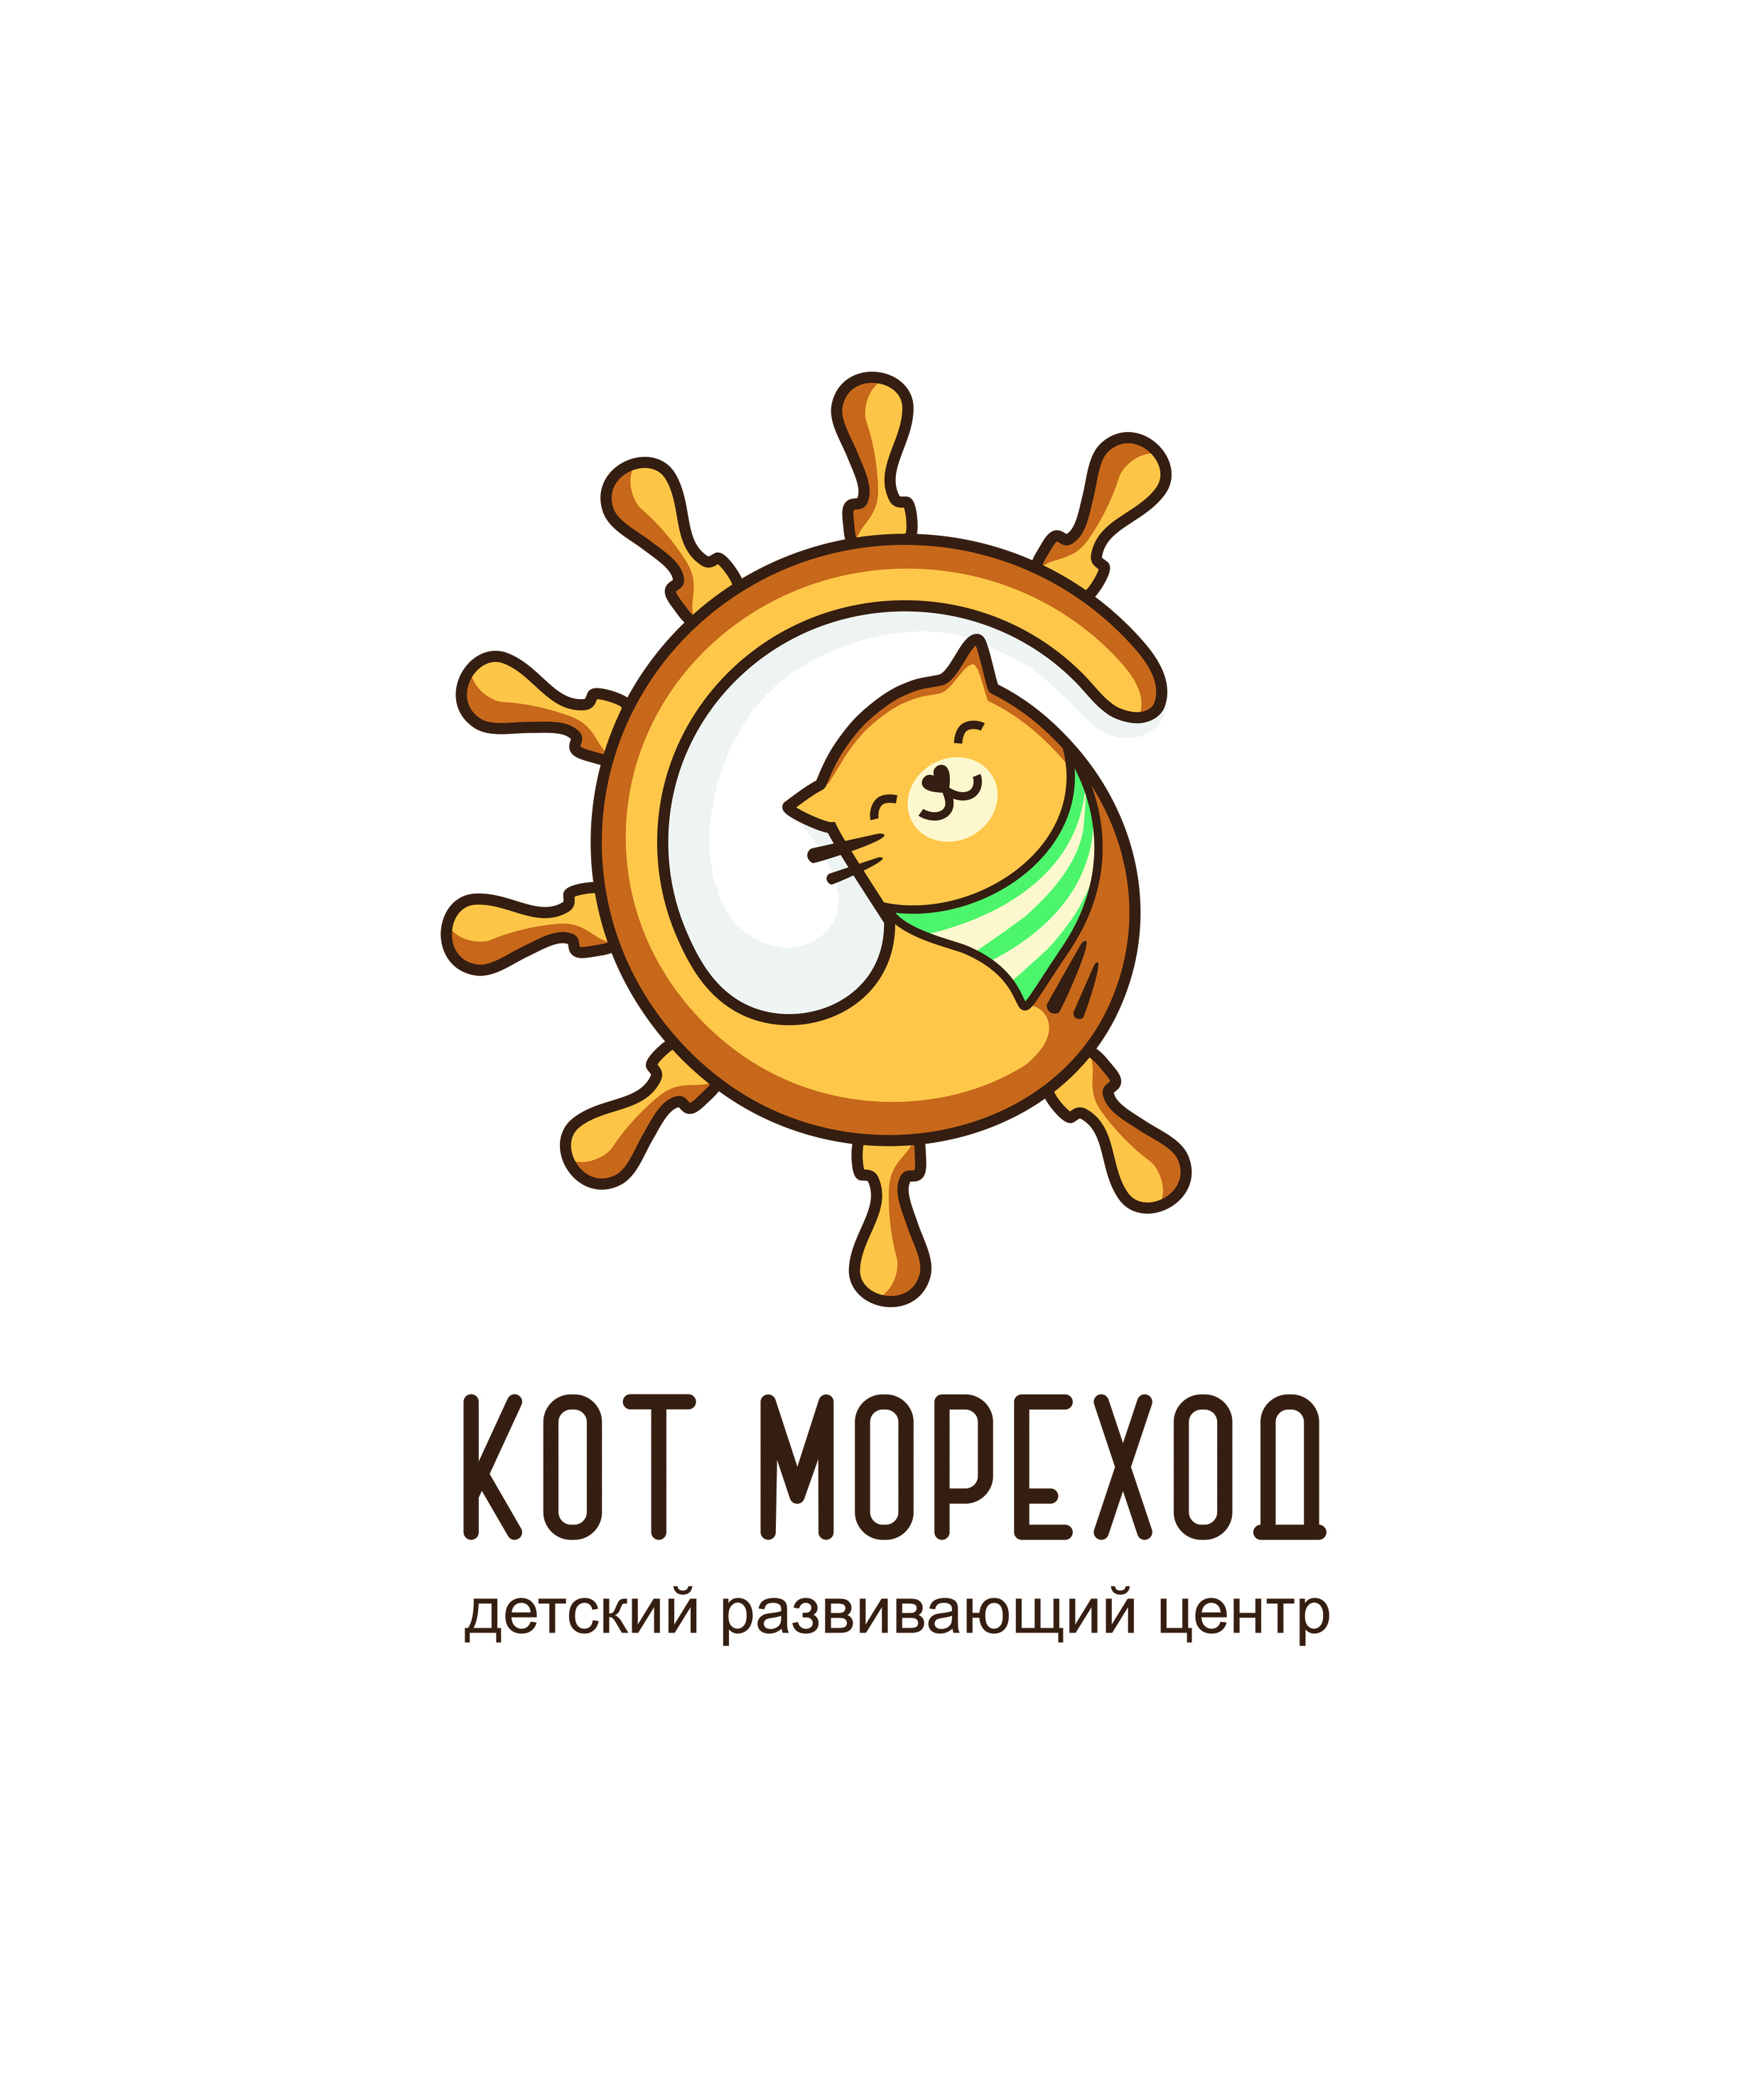 Разработка логотипа для детского центра фото f_5035d04125aac40e.jpg